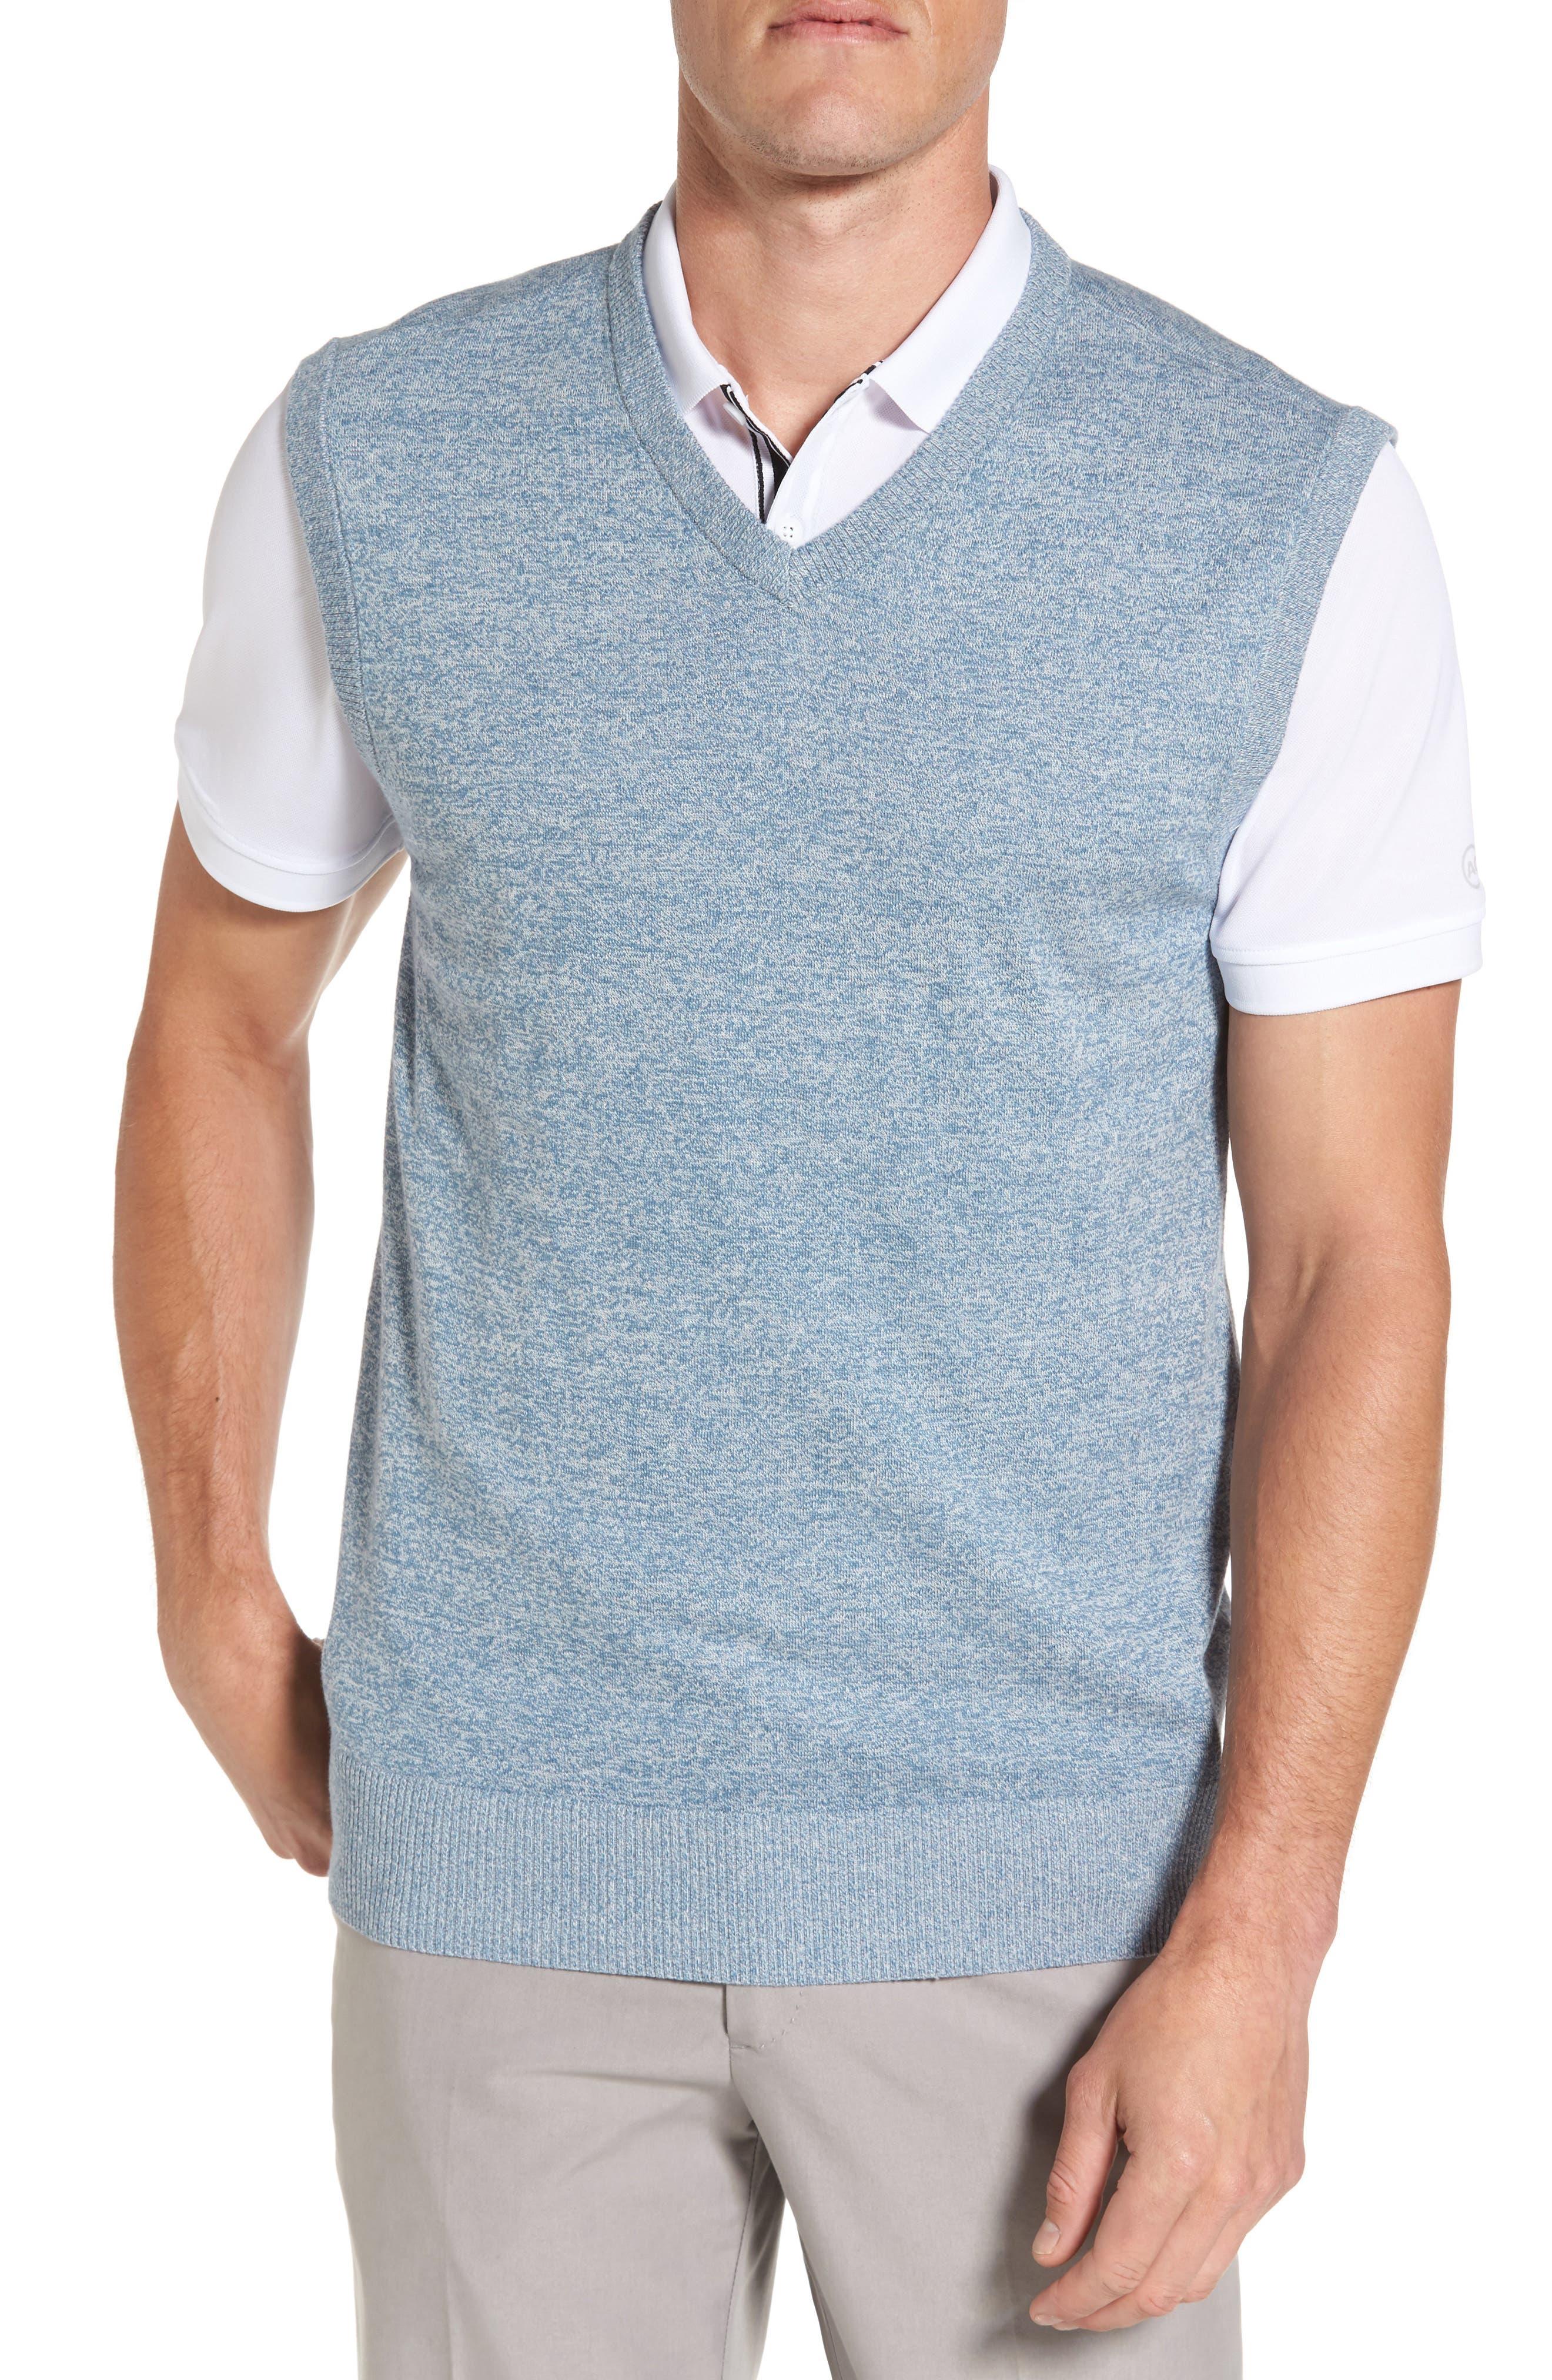 Valley V-Neck Sweater Vest,                         Main,                         color, Blue Print/ White Melange